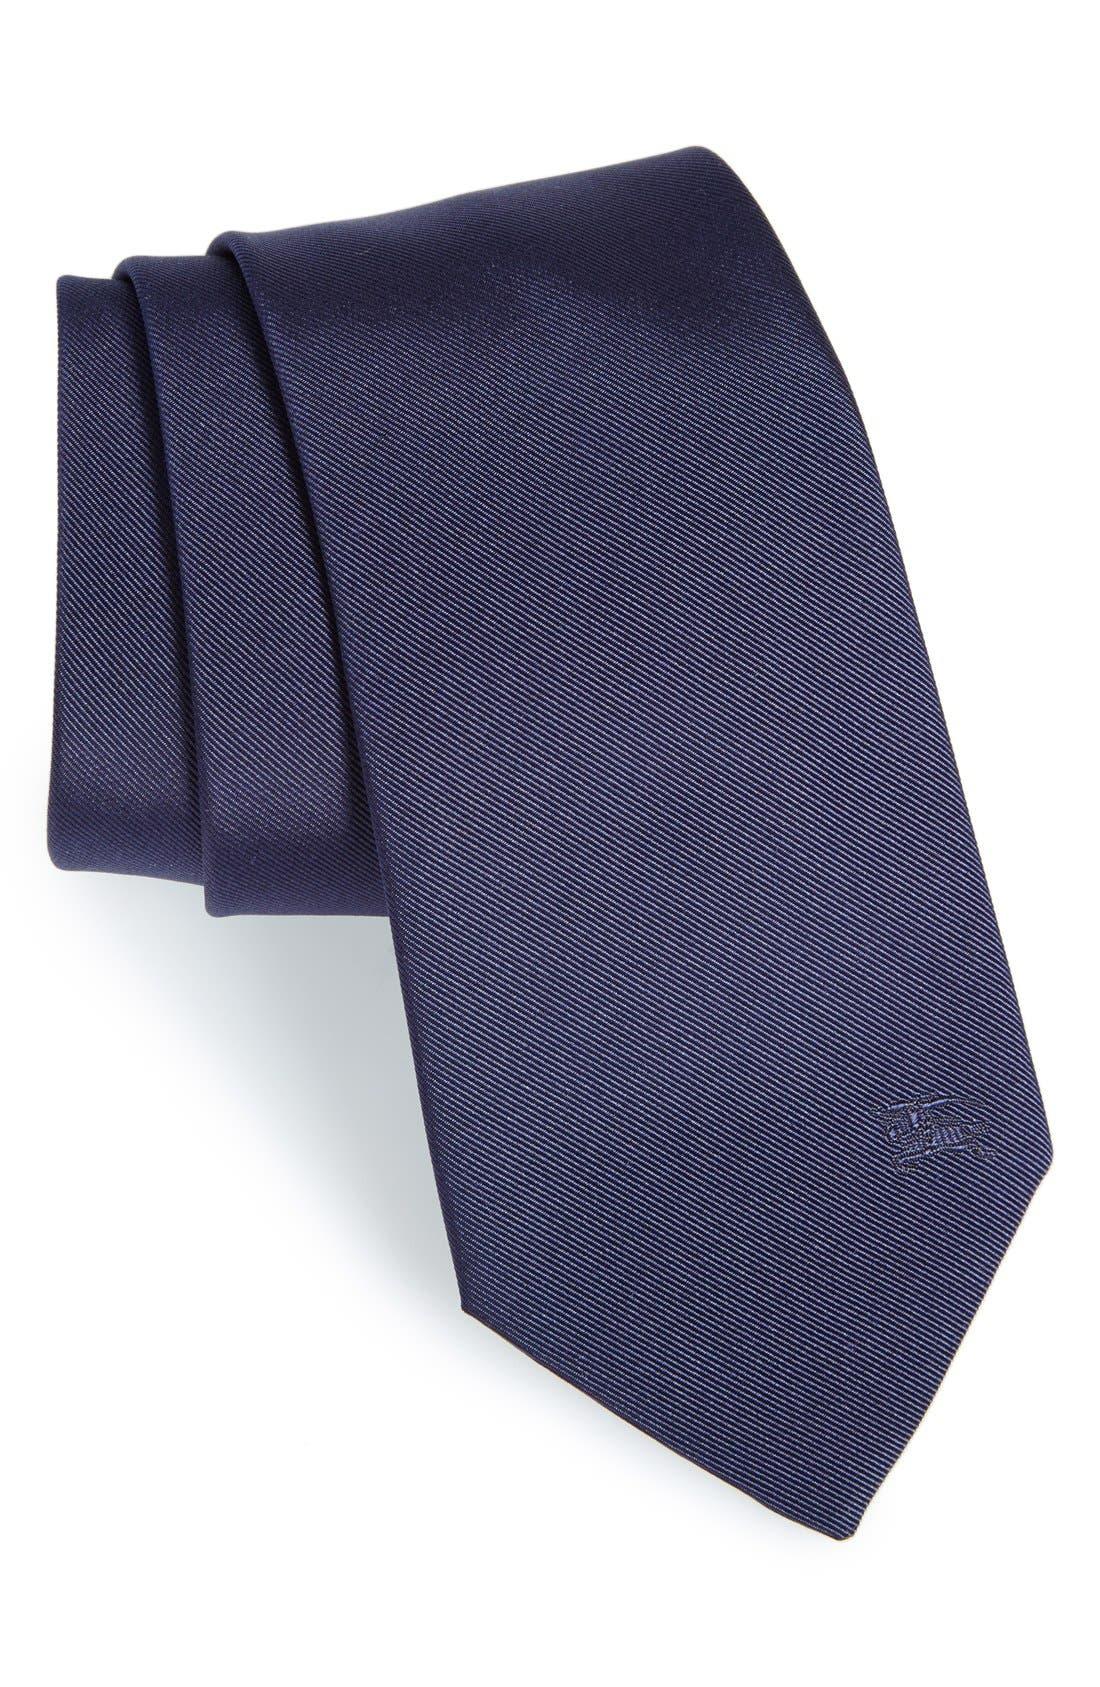 London 'Manston' Twill Silk Tie, Main, color, 410